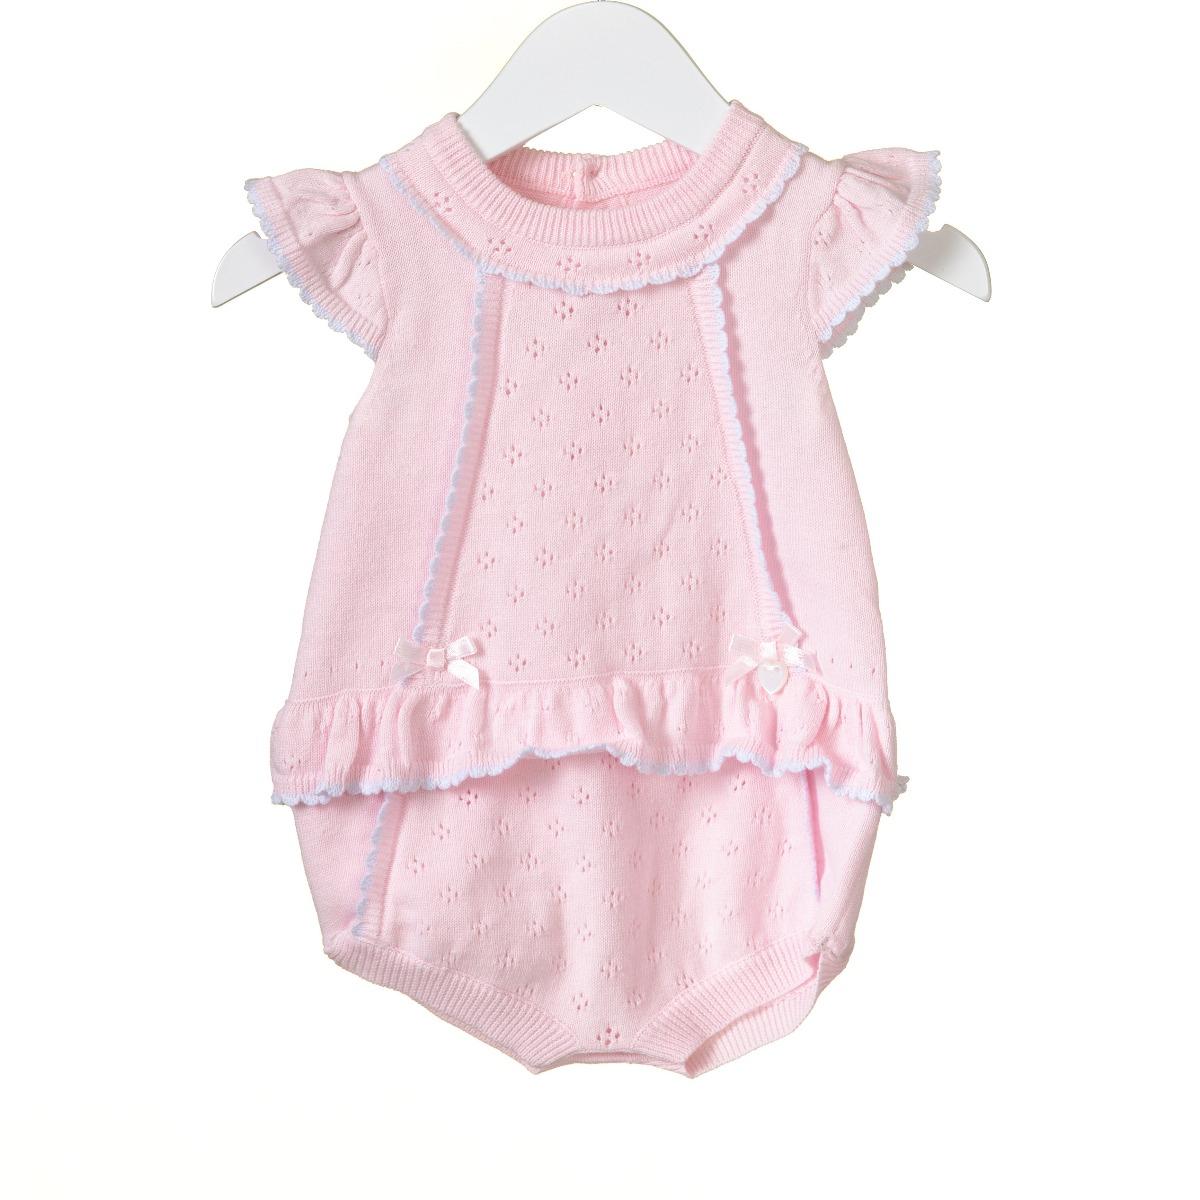 Roze gebreid babyrompertje